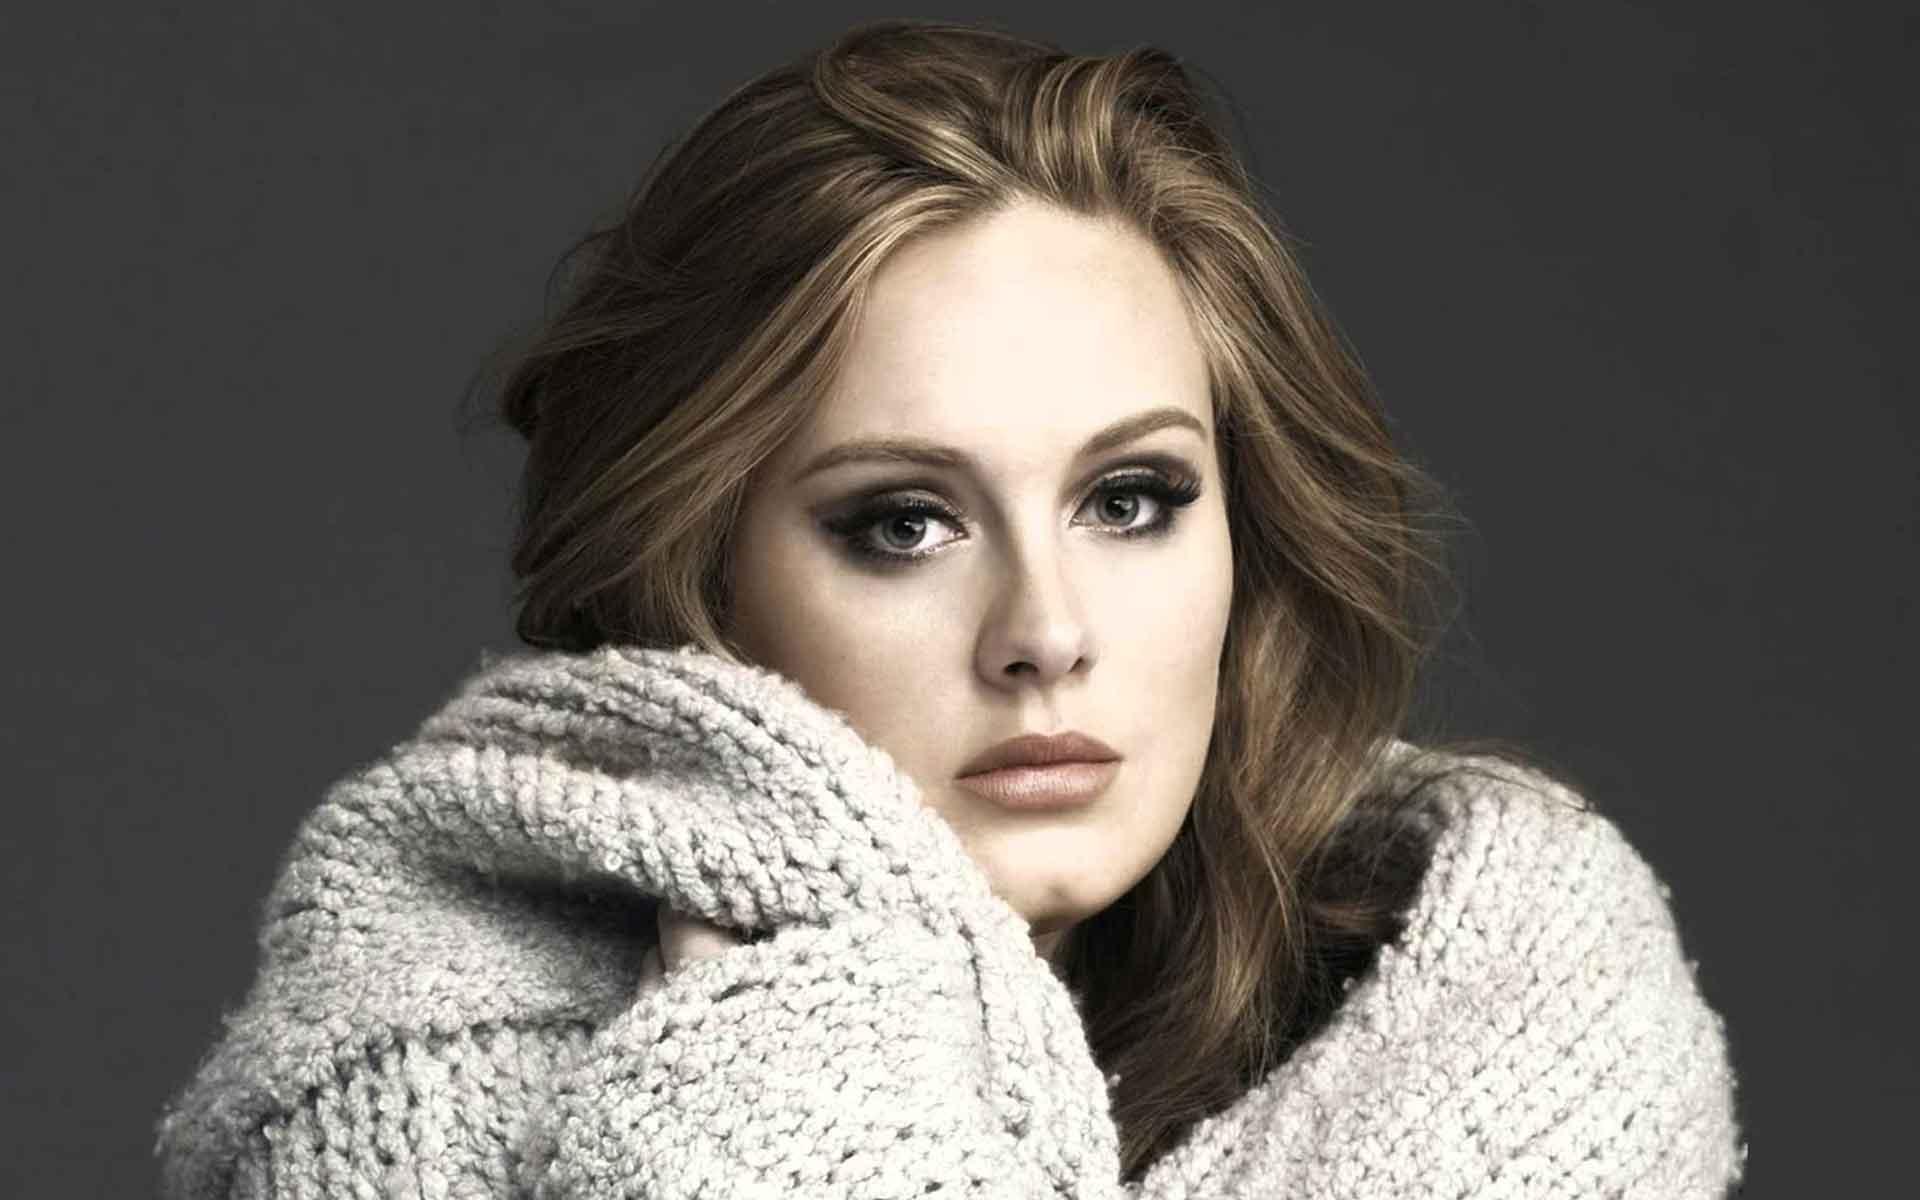 Adele-Laurie-Blue-Adkins-